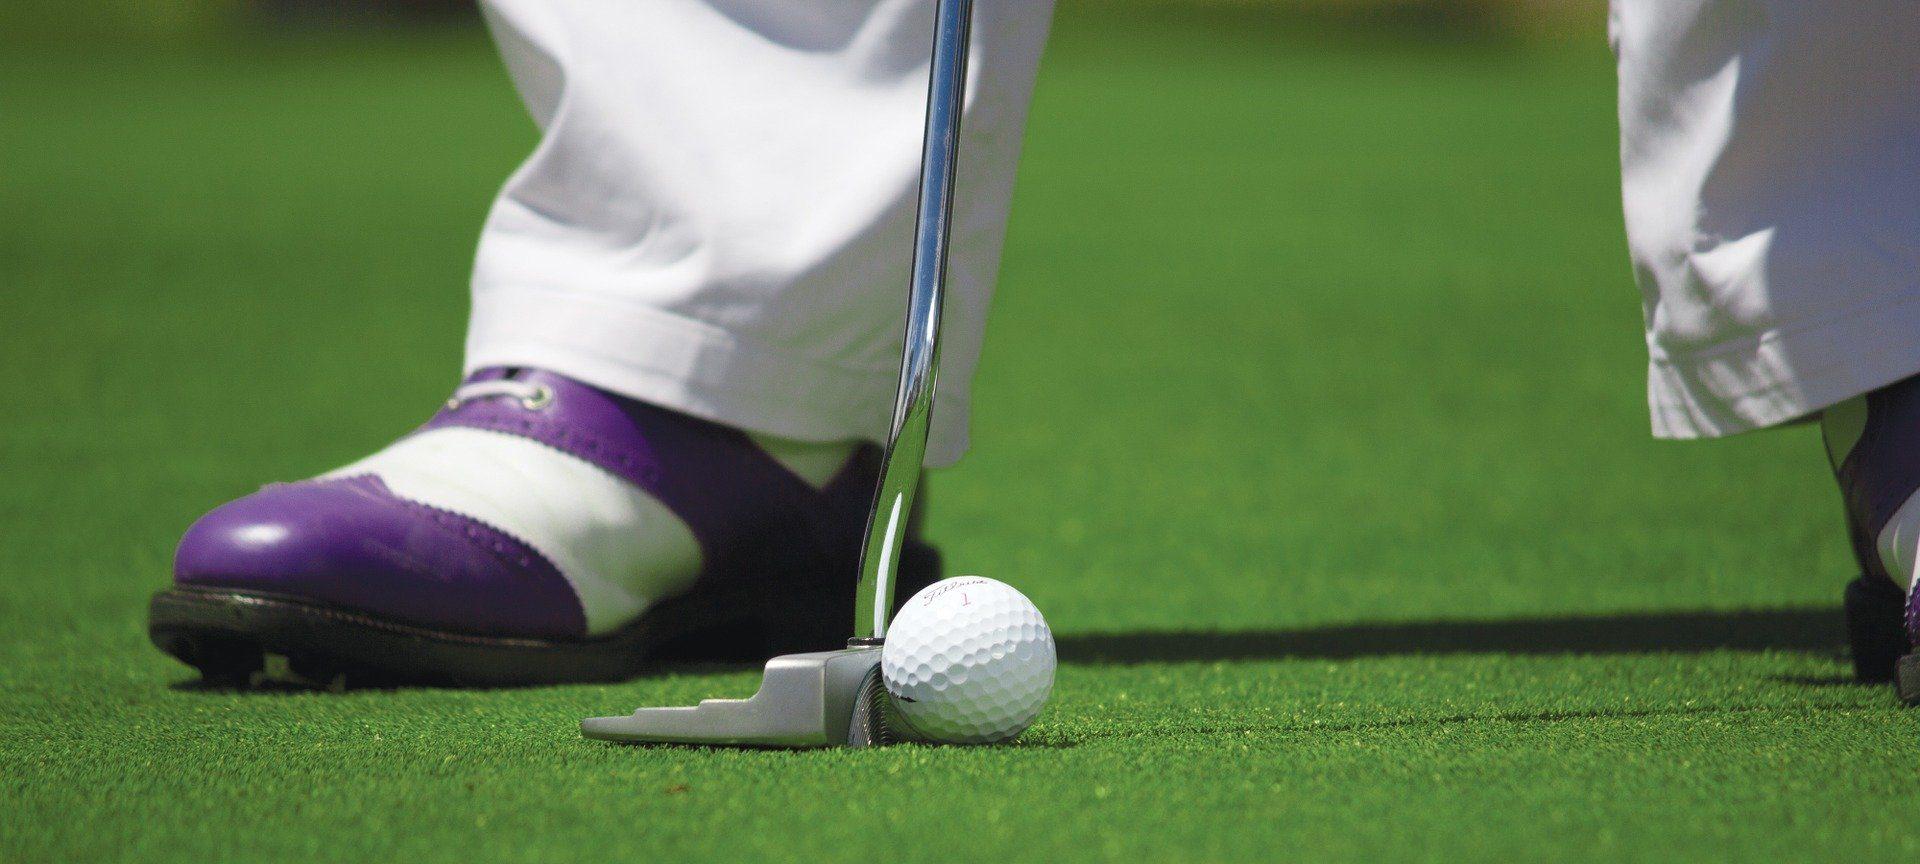 Brock Township's charity golf tournament returns this summer